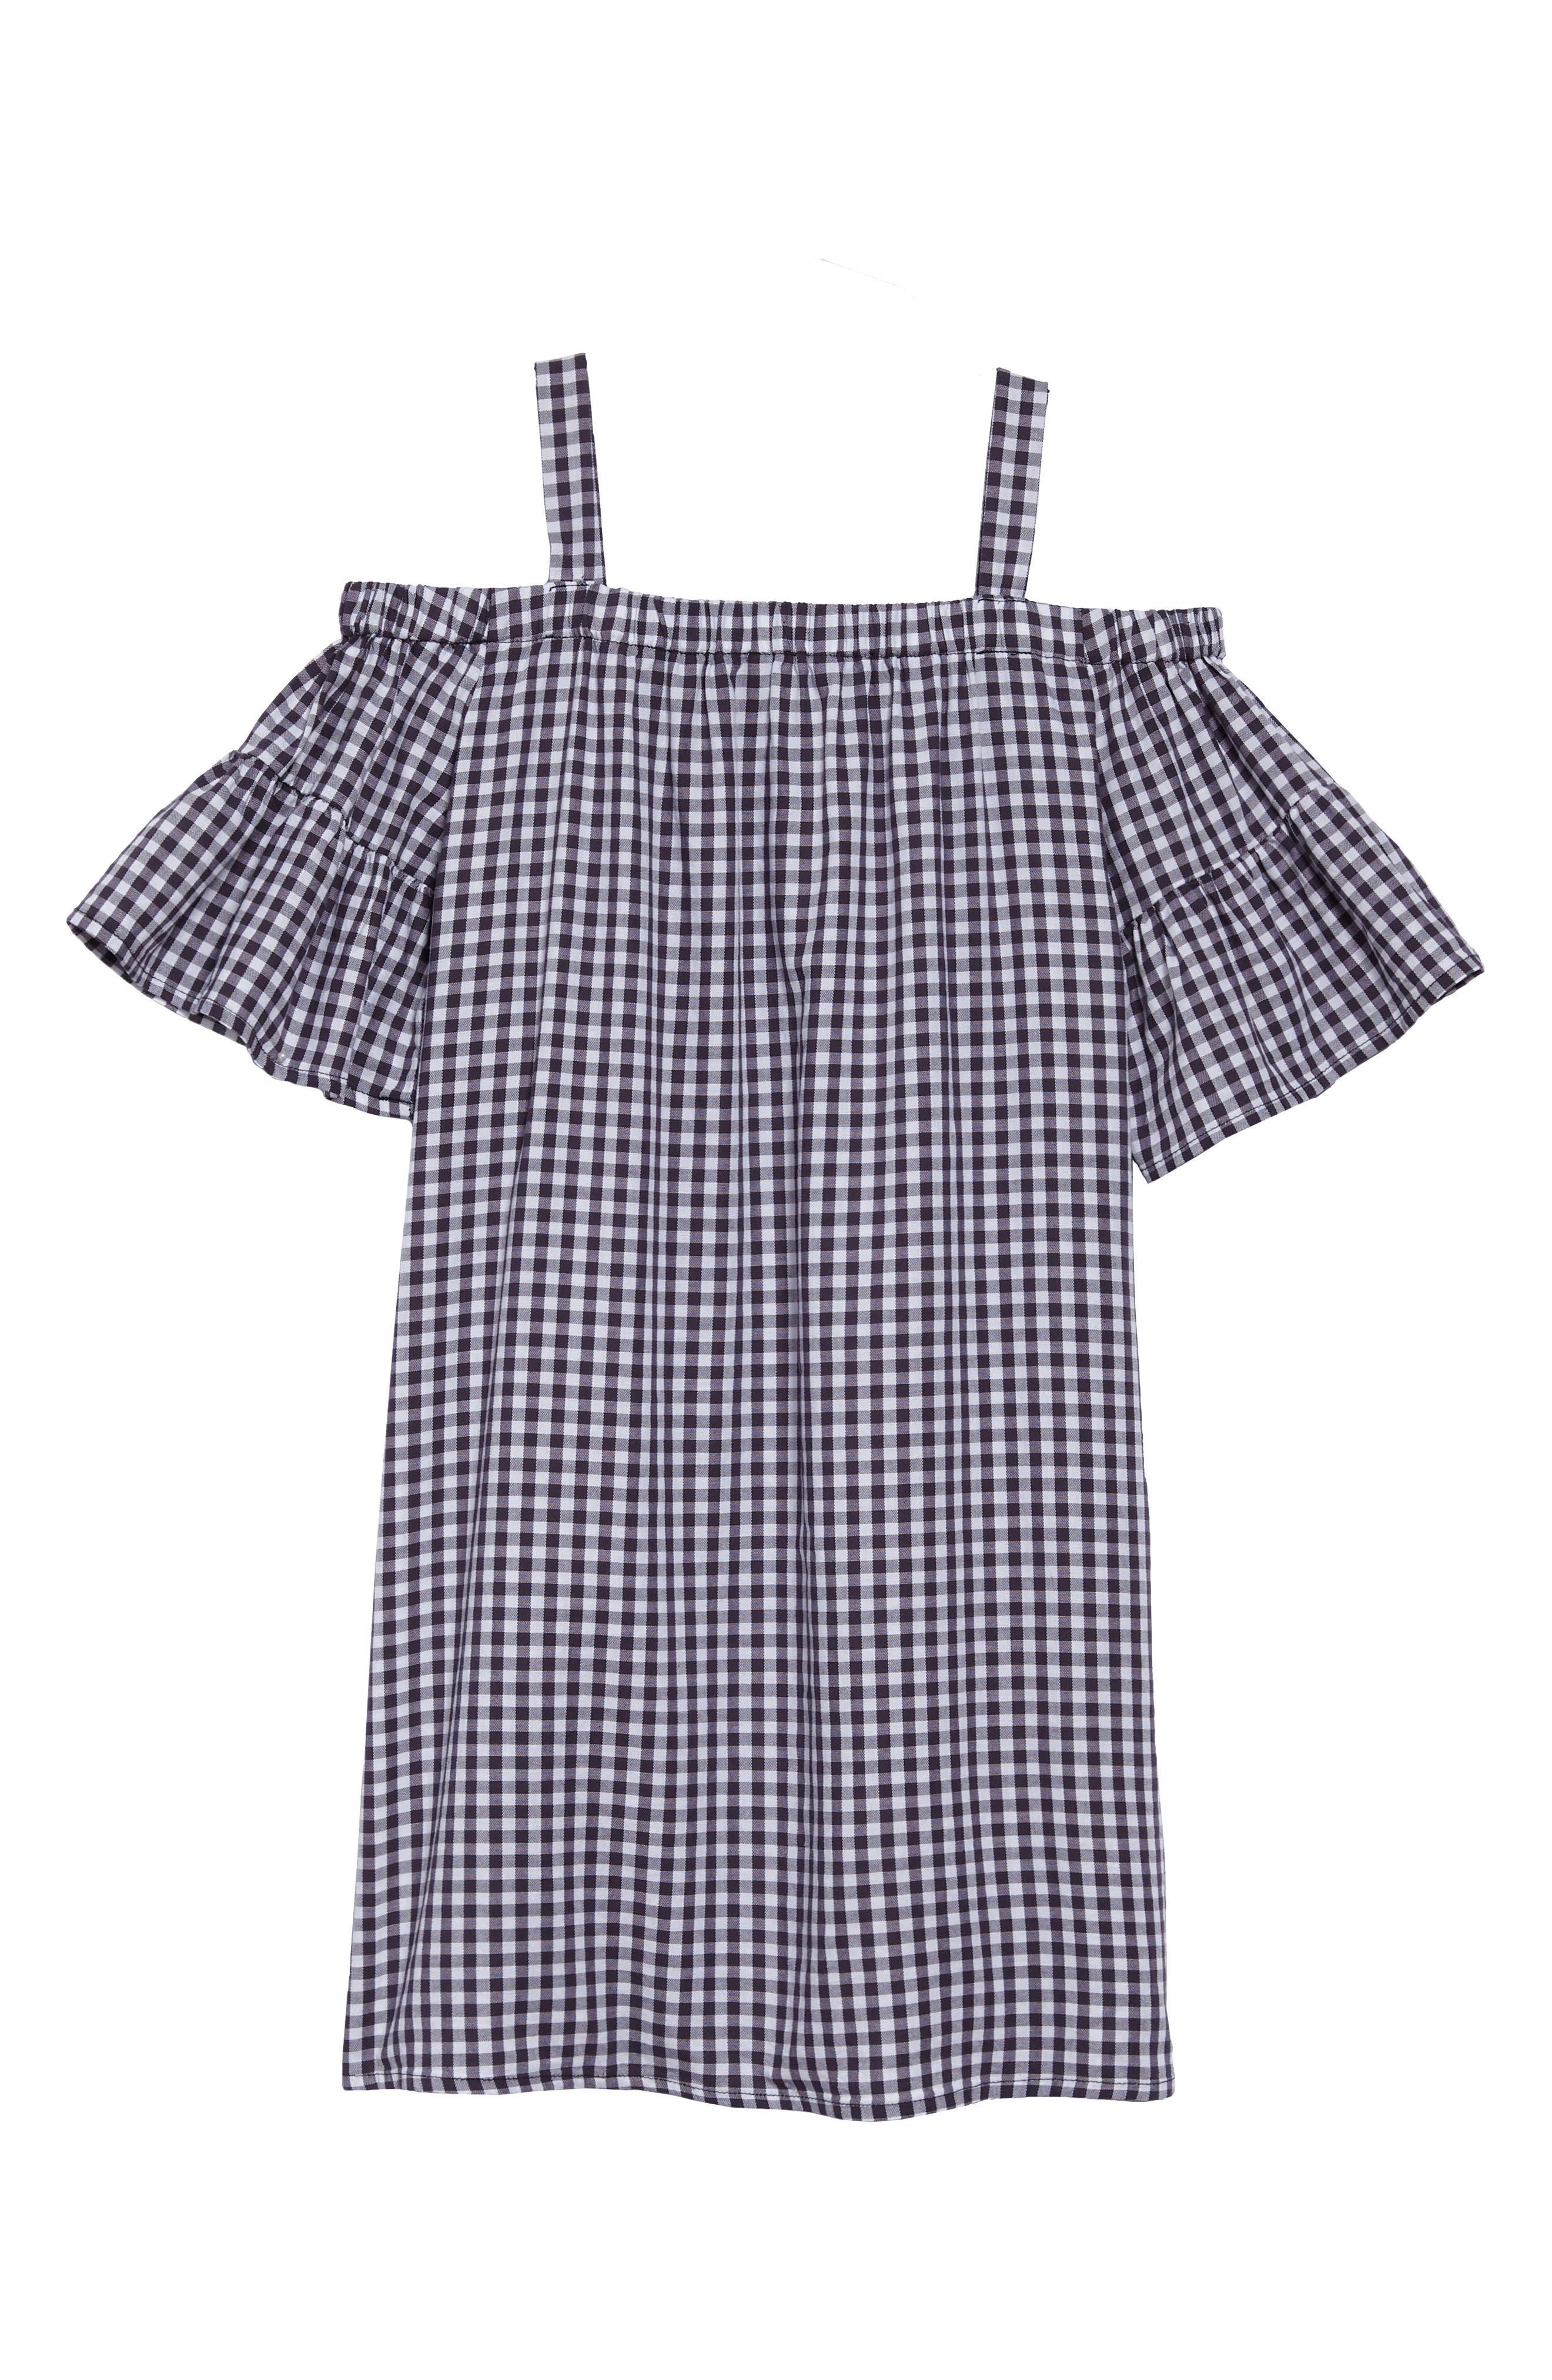 Jenny Check Cold Shoulder Dress,                             Alternate thumbnail 2, color,                             001